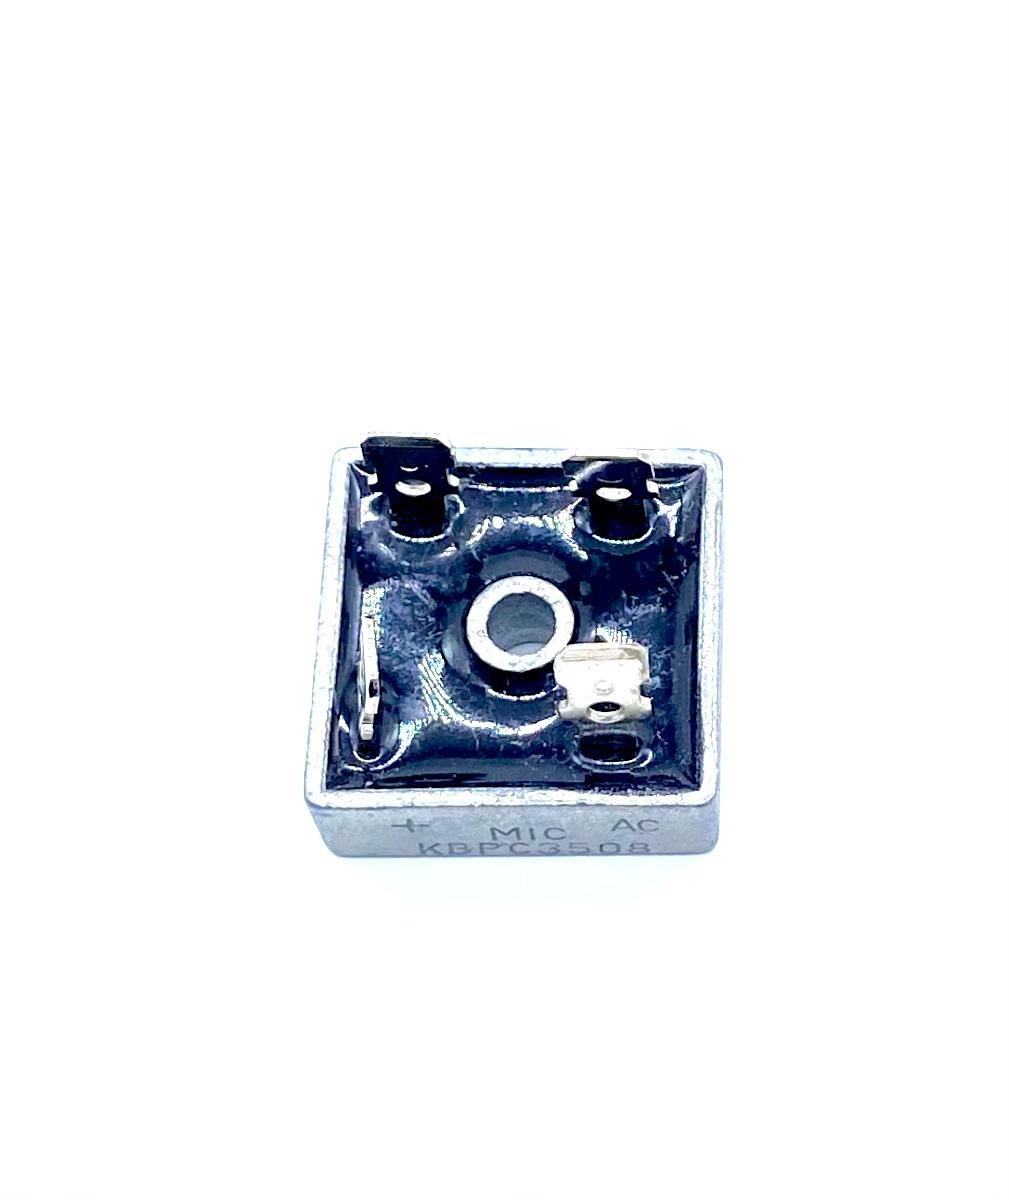 PONTE RETIFICADORA KBPC3508 MIC